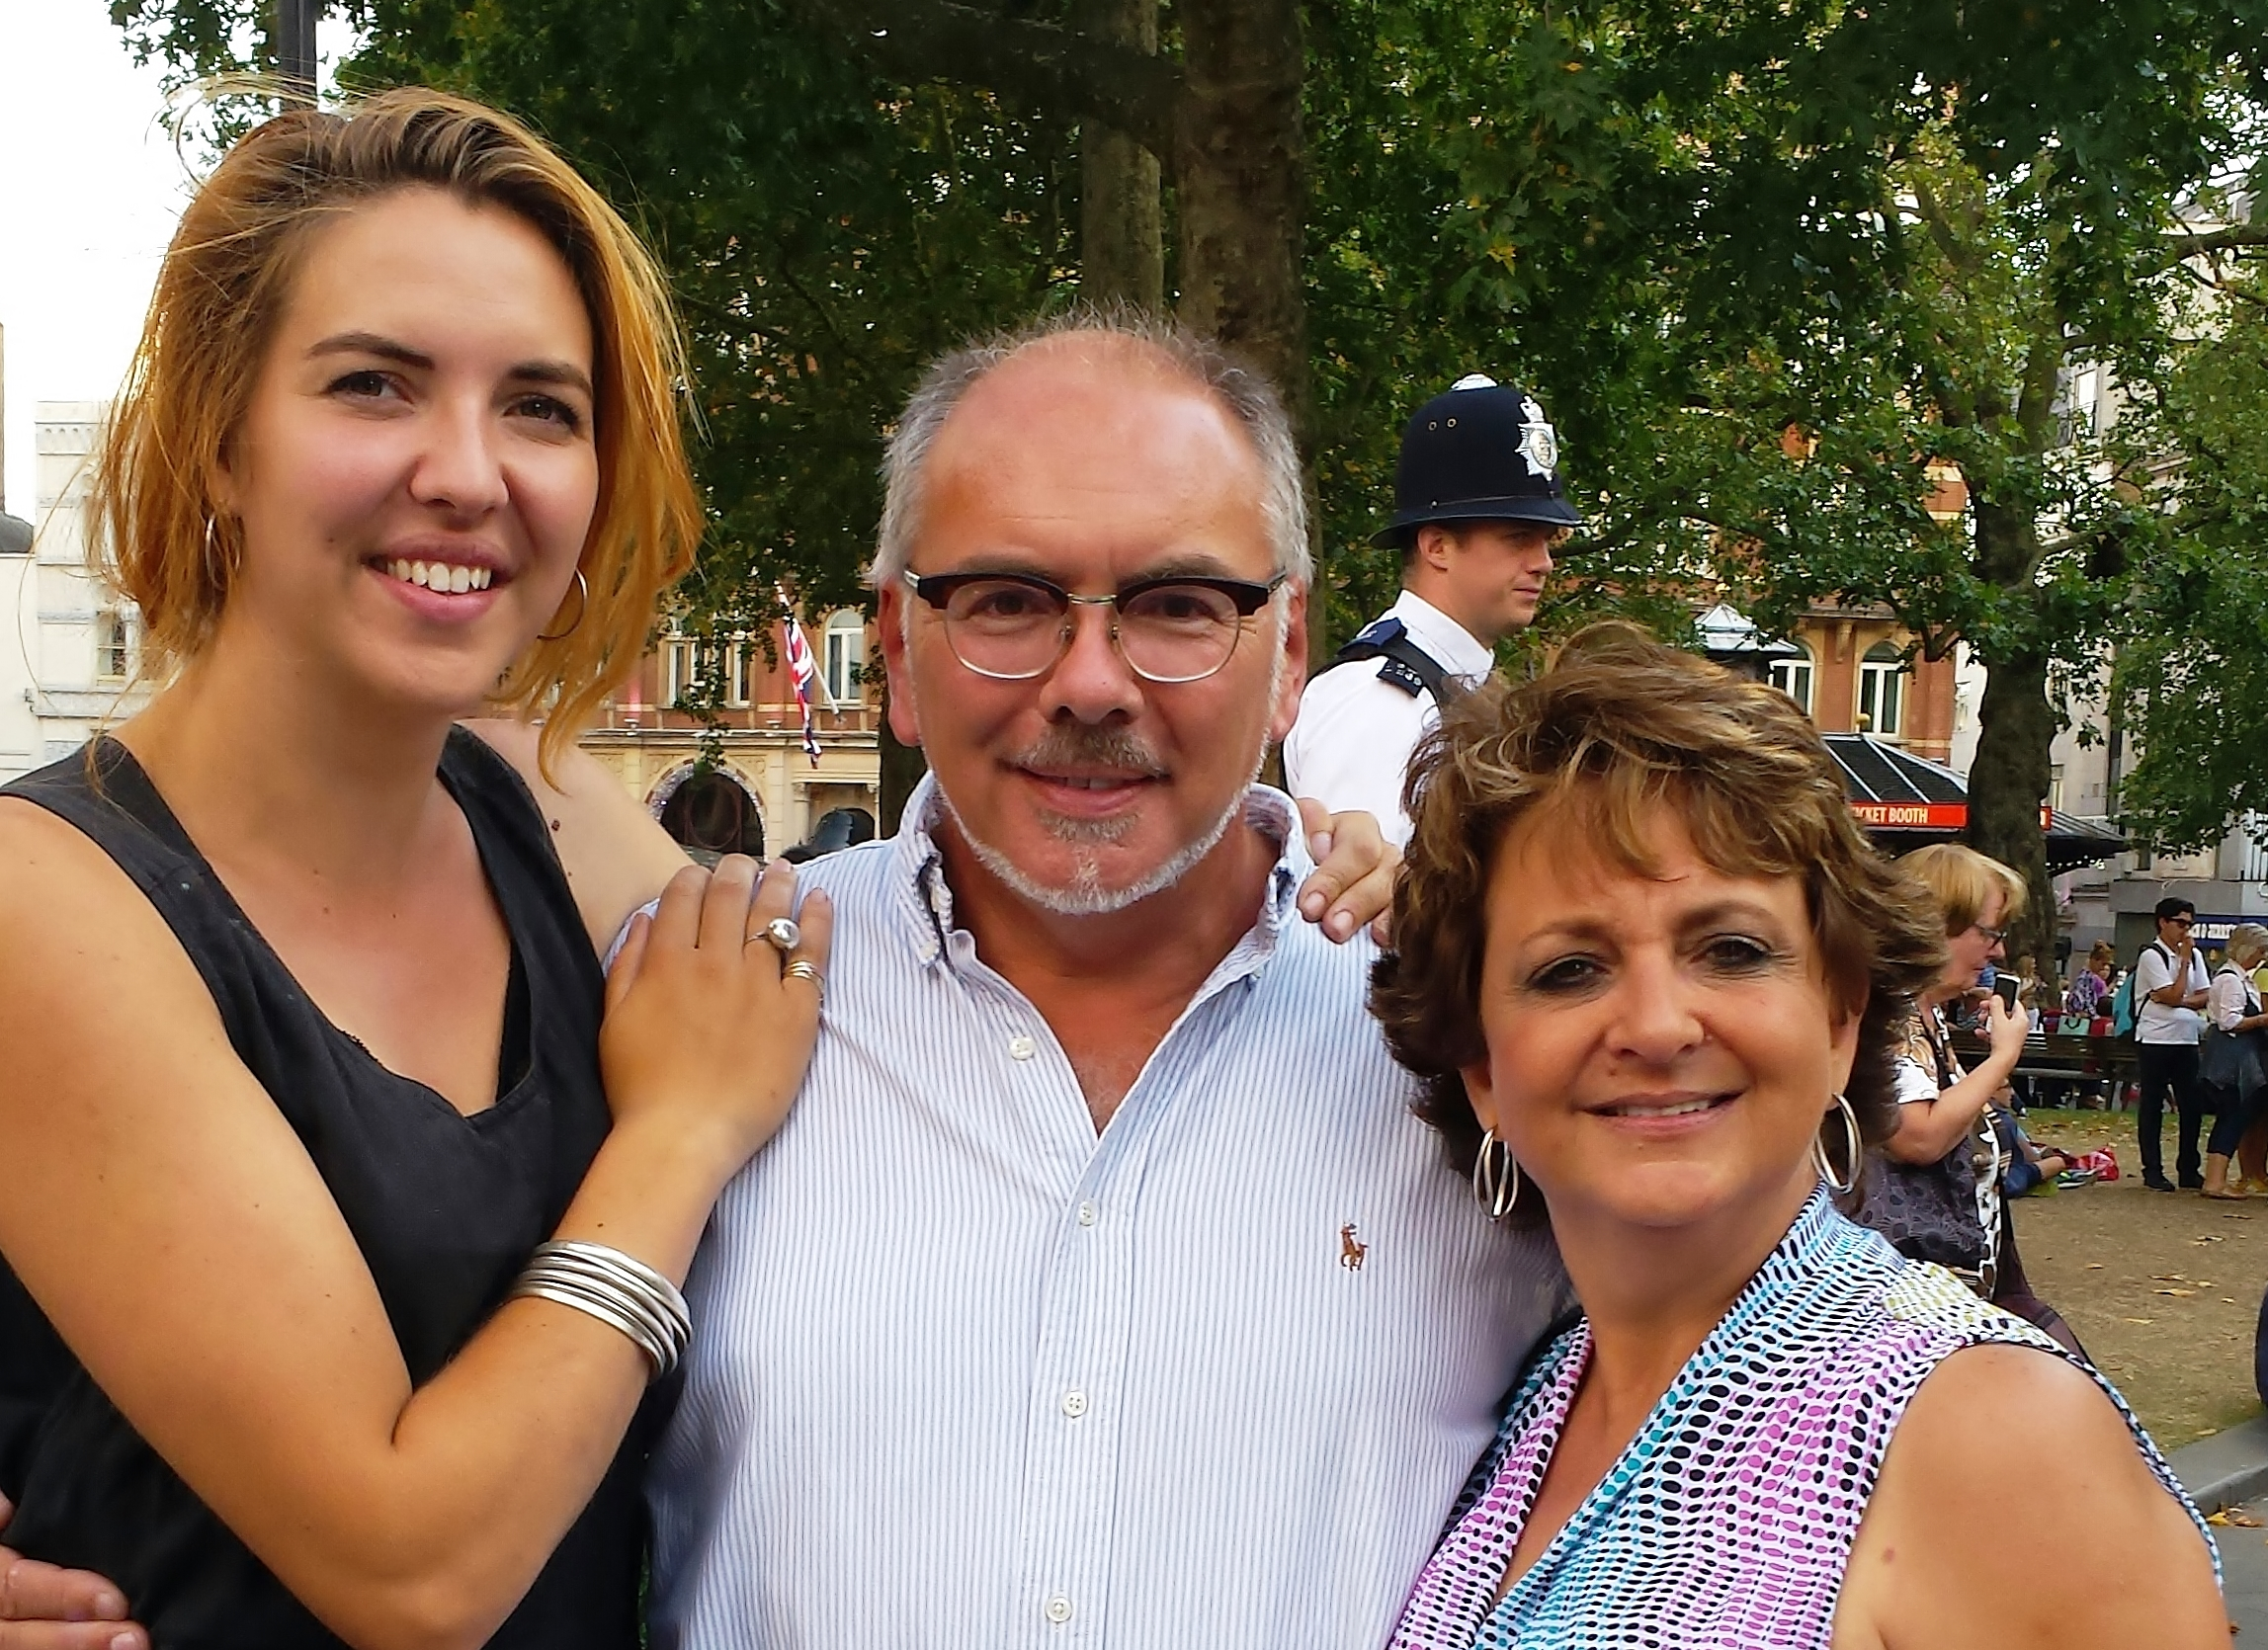 Harri, Kelly and myself in London